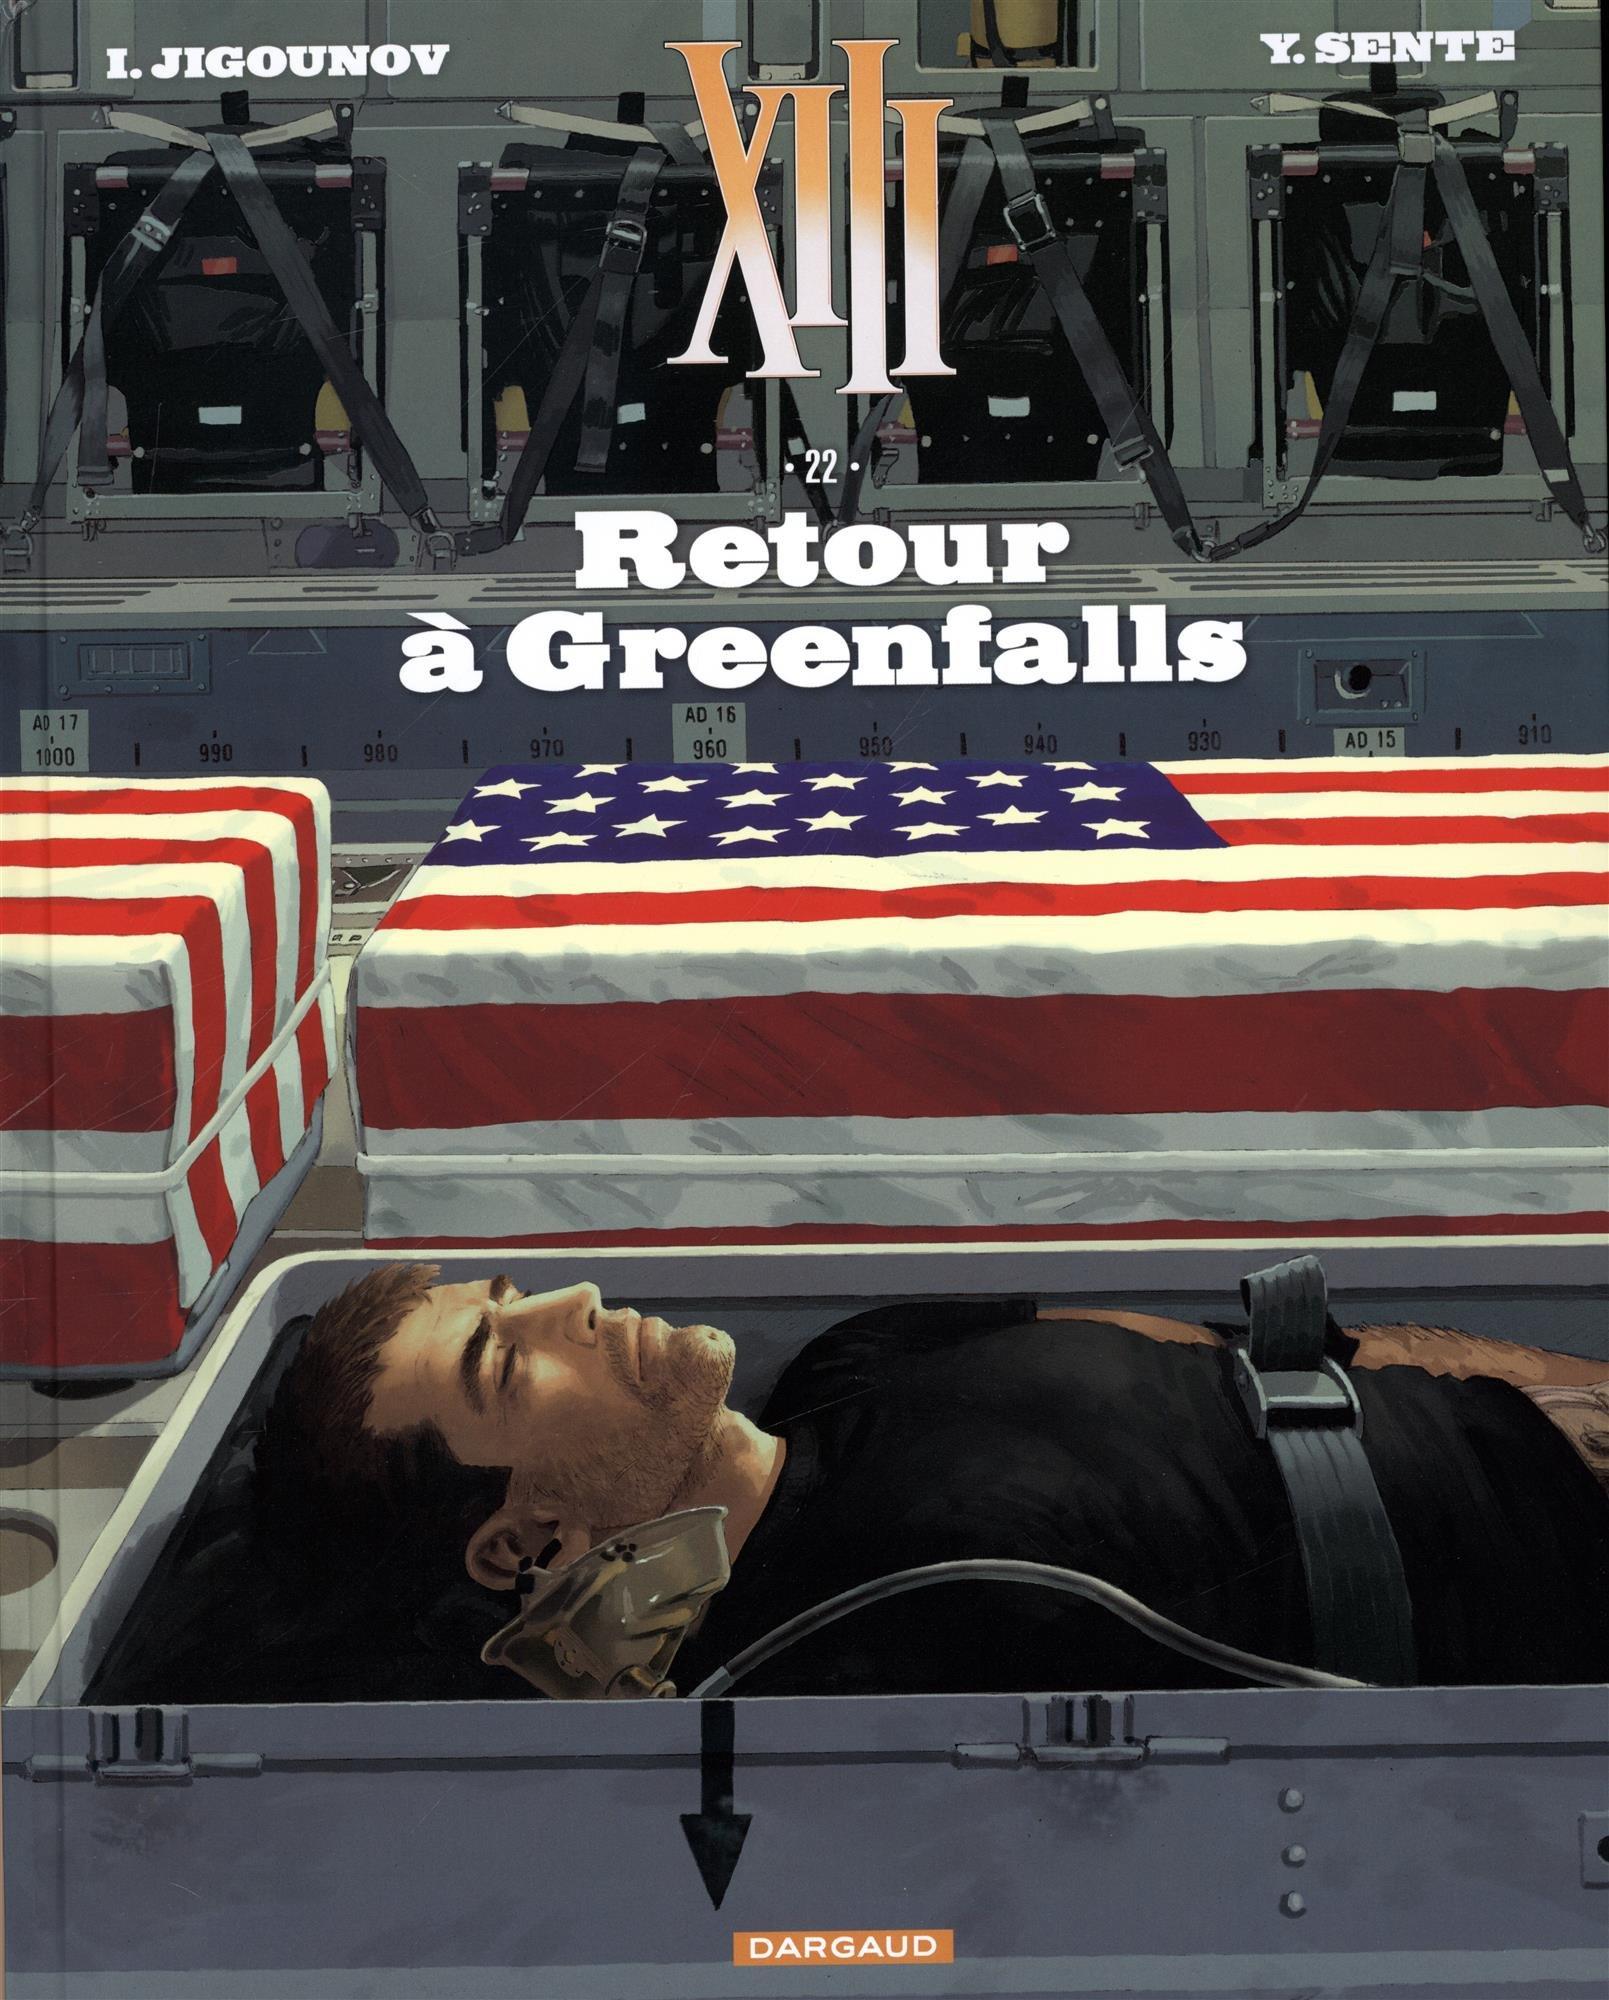 XIII - Nouvelle collection - tome 22 - Retour à Greenfalls Album – 13 octobre 2017 Sente Yves Jigounov Iouri Dargaud 2505067686